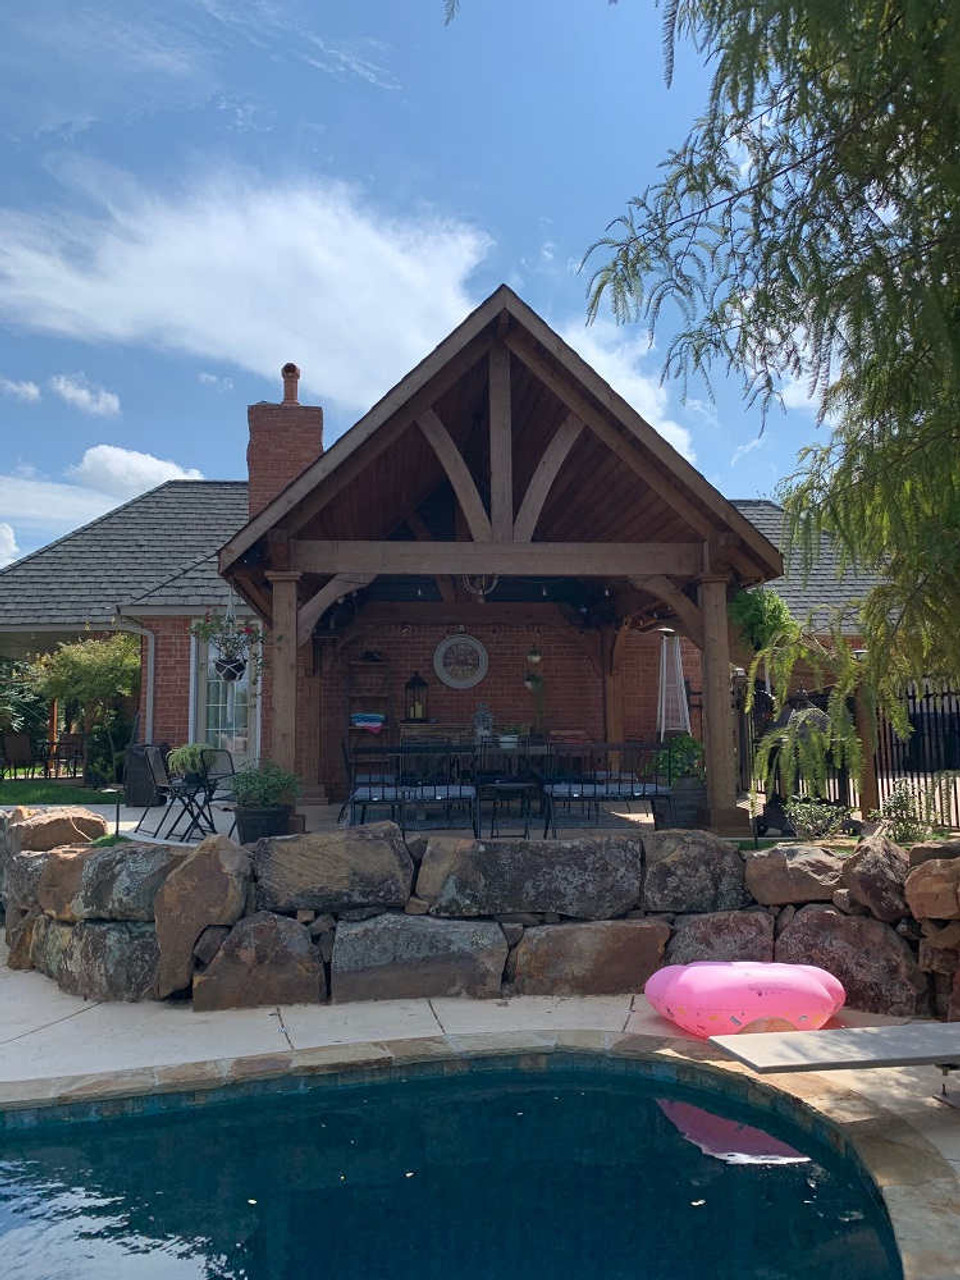 14x14 Grand Cedar Pavlion Kit Poolside, Oklahoma City, Oklahoma